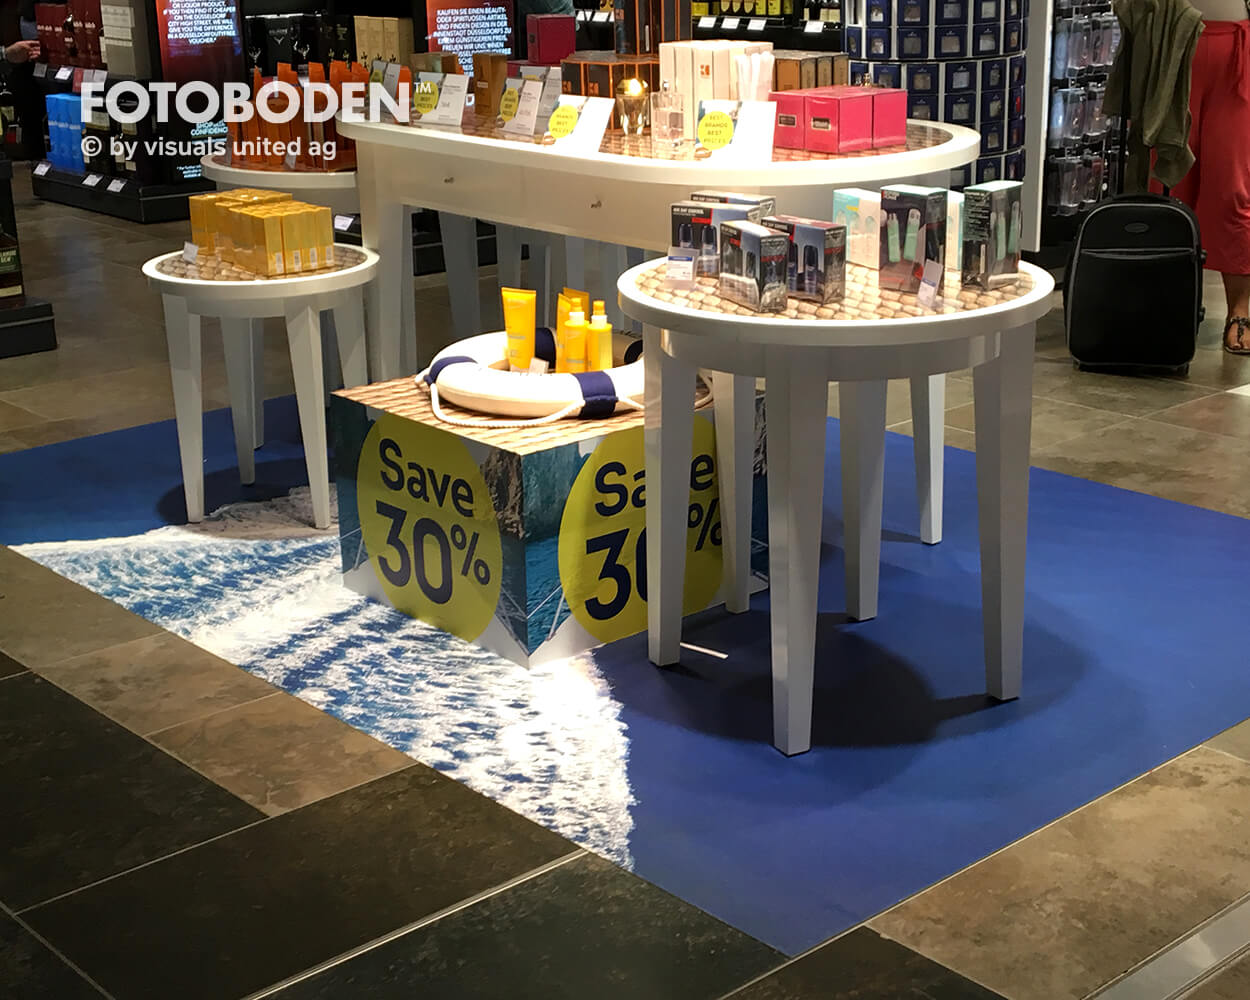 Bbbp Fotoboden Flooring Fußboden Bodengestaltung Floorminder Bodendruck Werbung Fußbodenwerbung Bodenwerbung Merchandising Advertising Visualmerchandising2